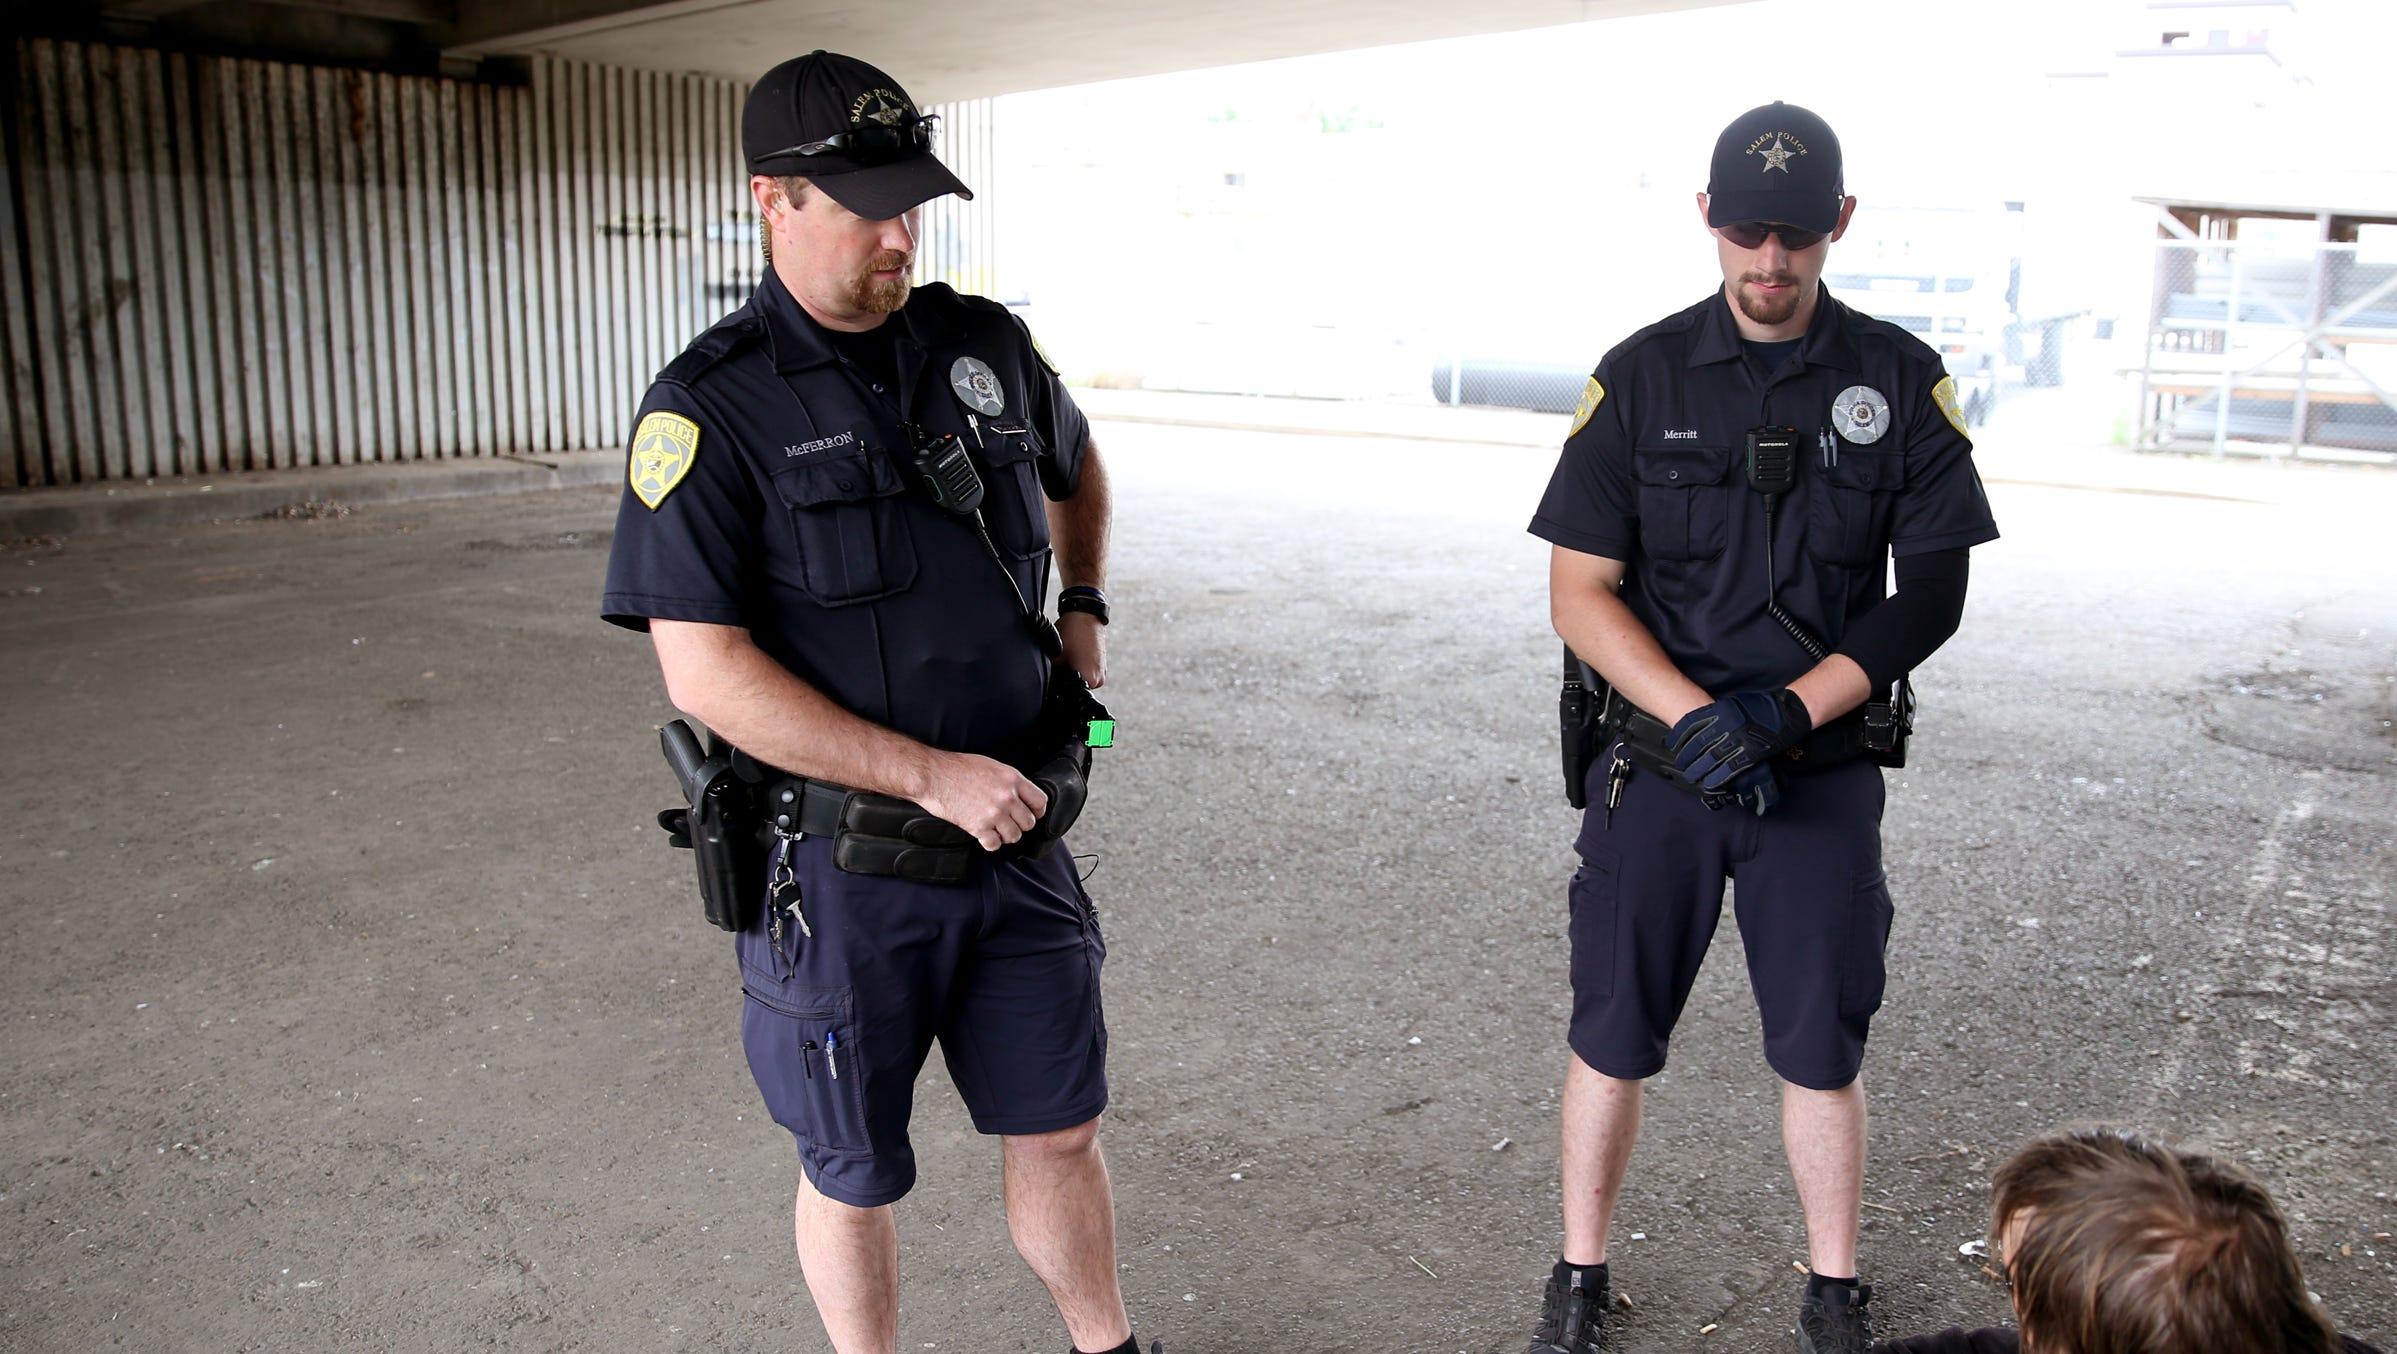 Policing: Salem police on front line of crisis